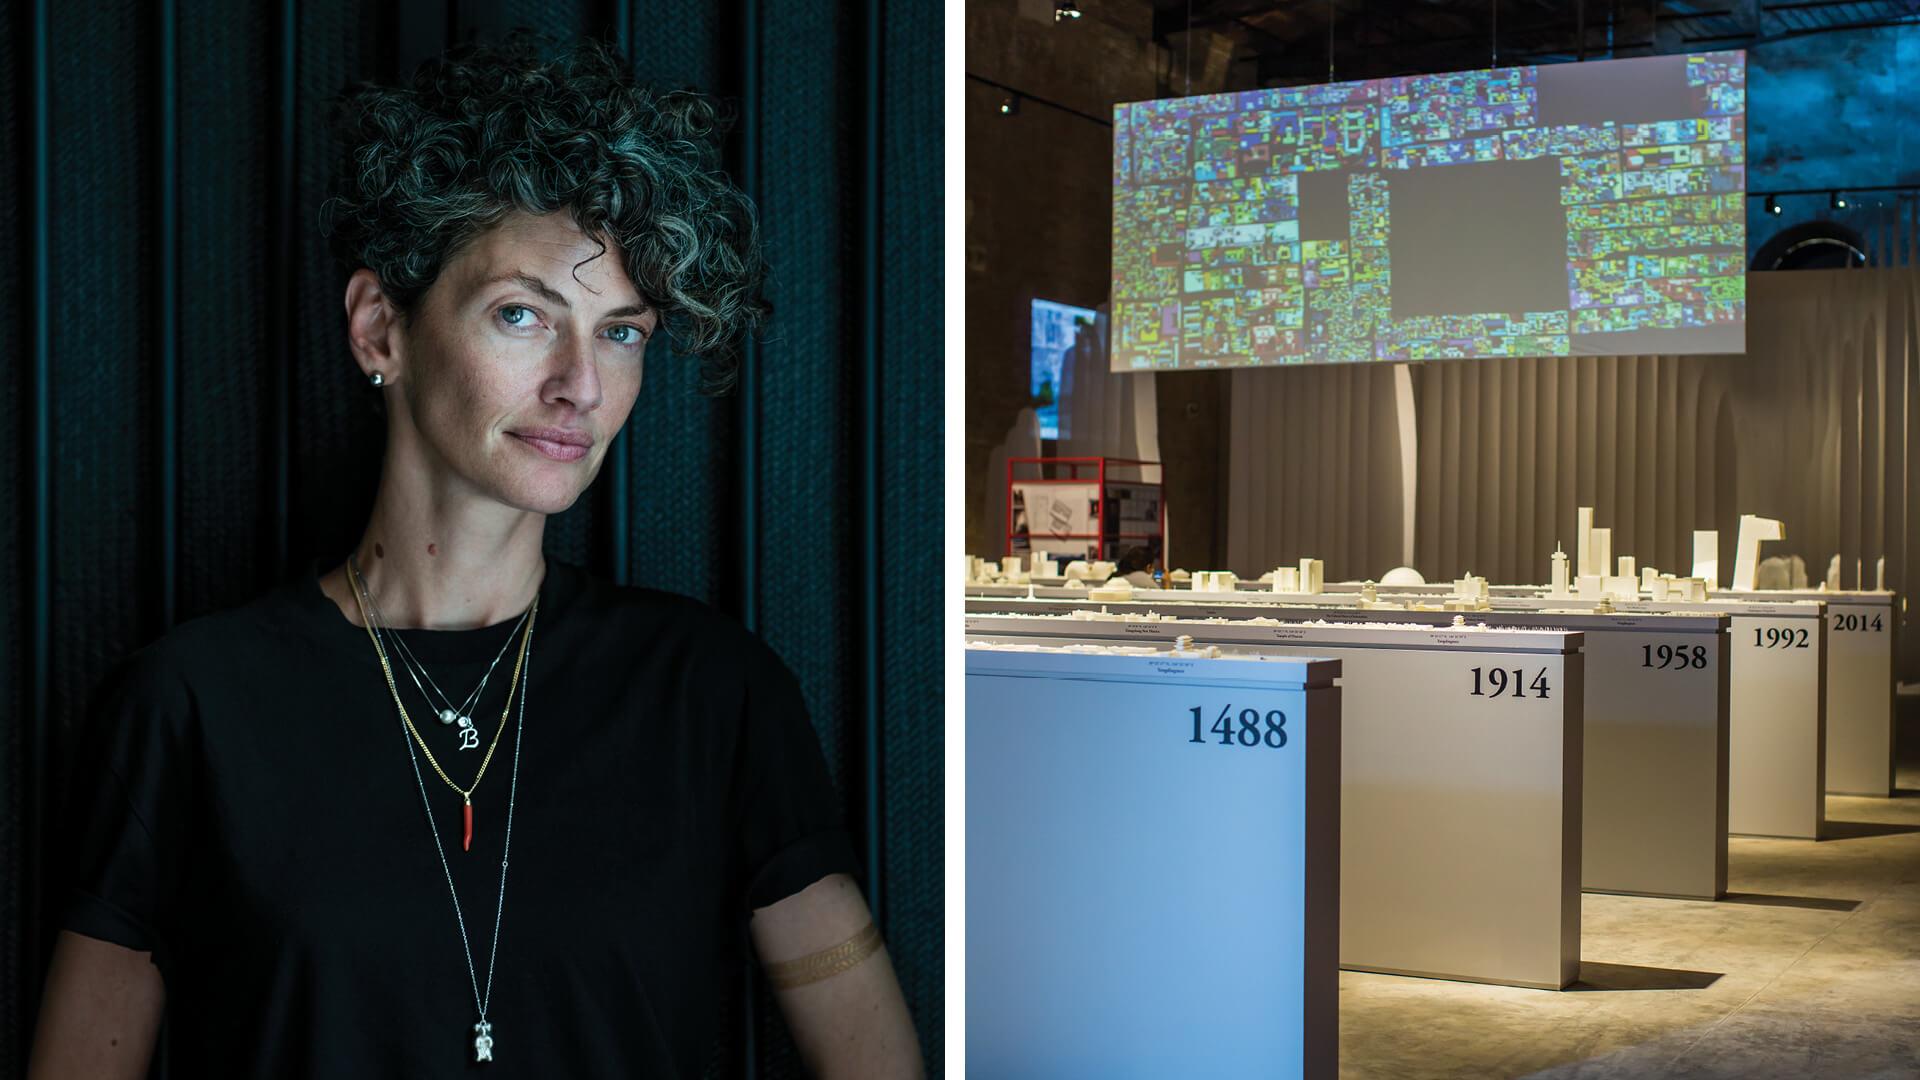 Between discipline and creative generosity: Beatrice Leanza's idea of good design